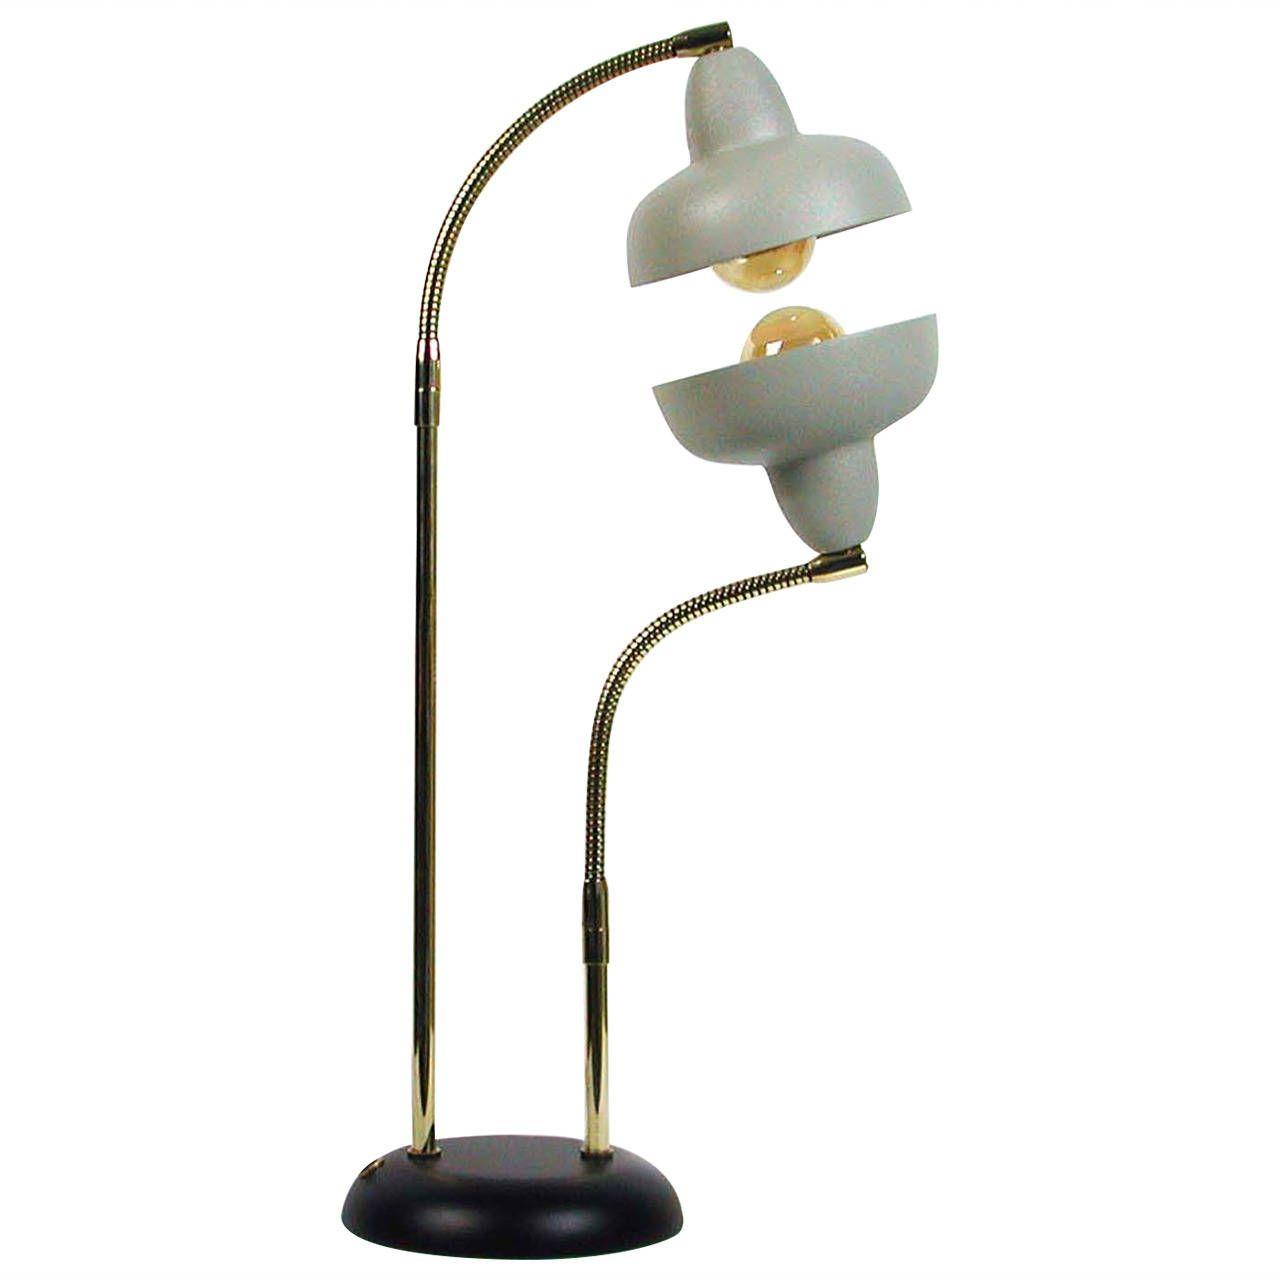 Italian Double Gooseneck Floor Lamp